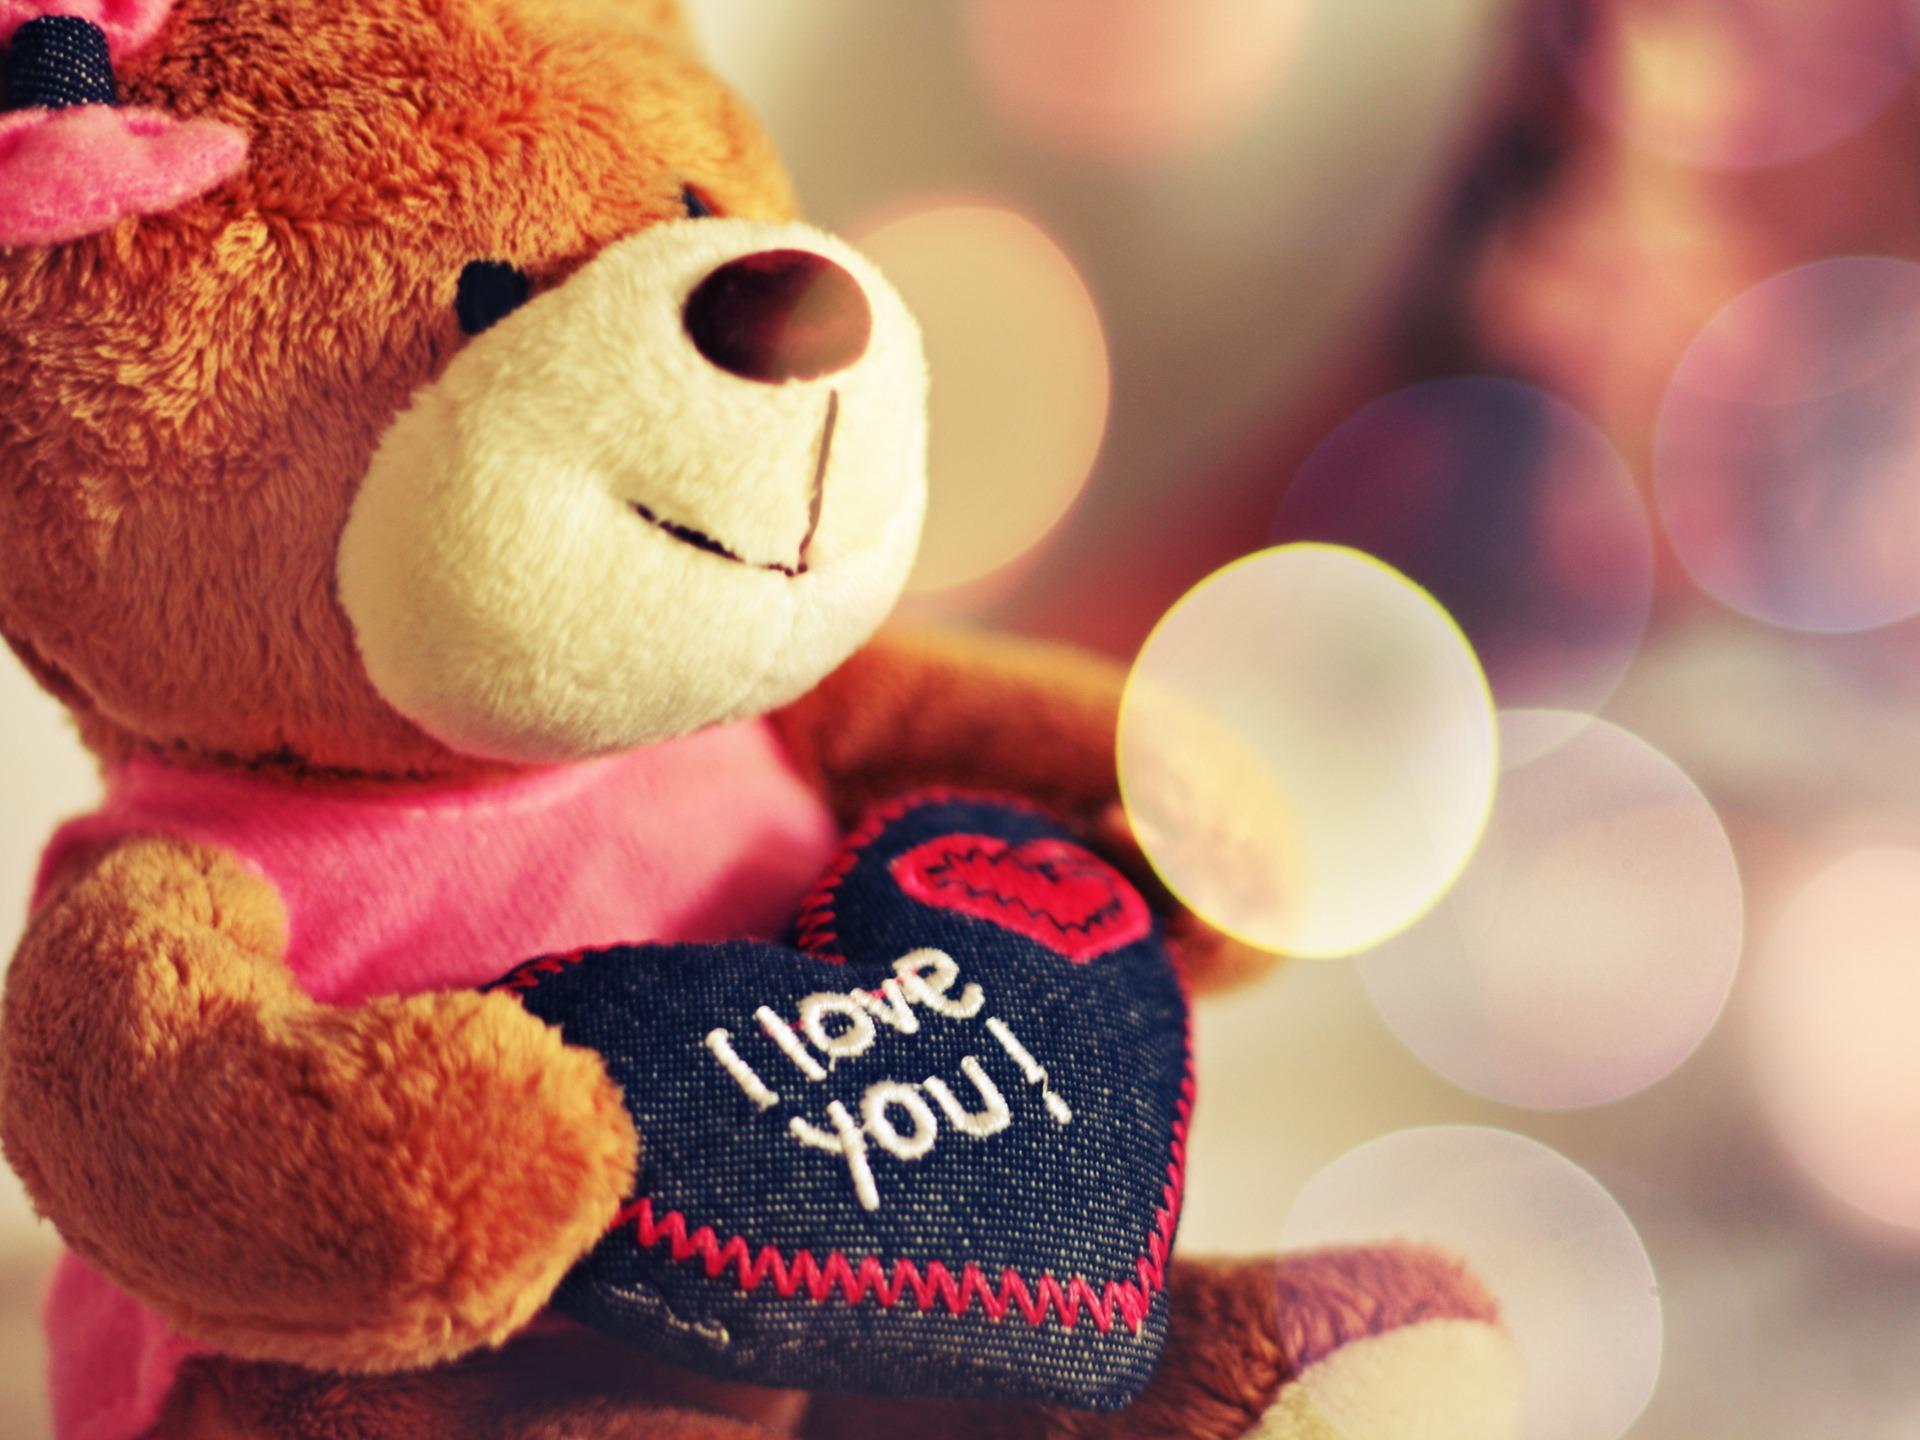 teddy-bear-love-1920-1440-7510